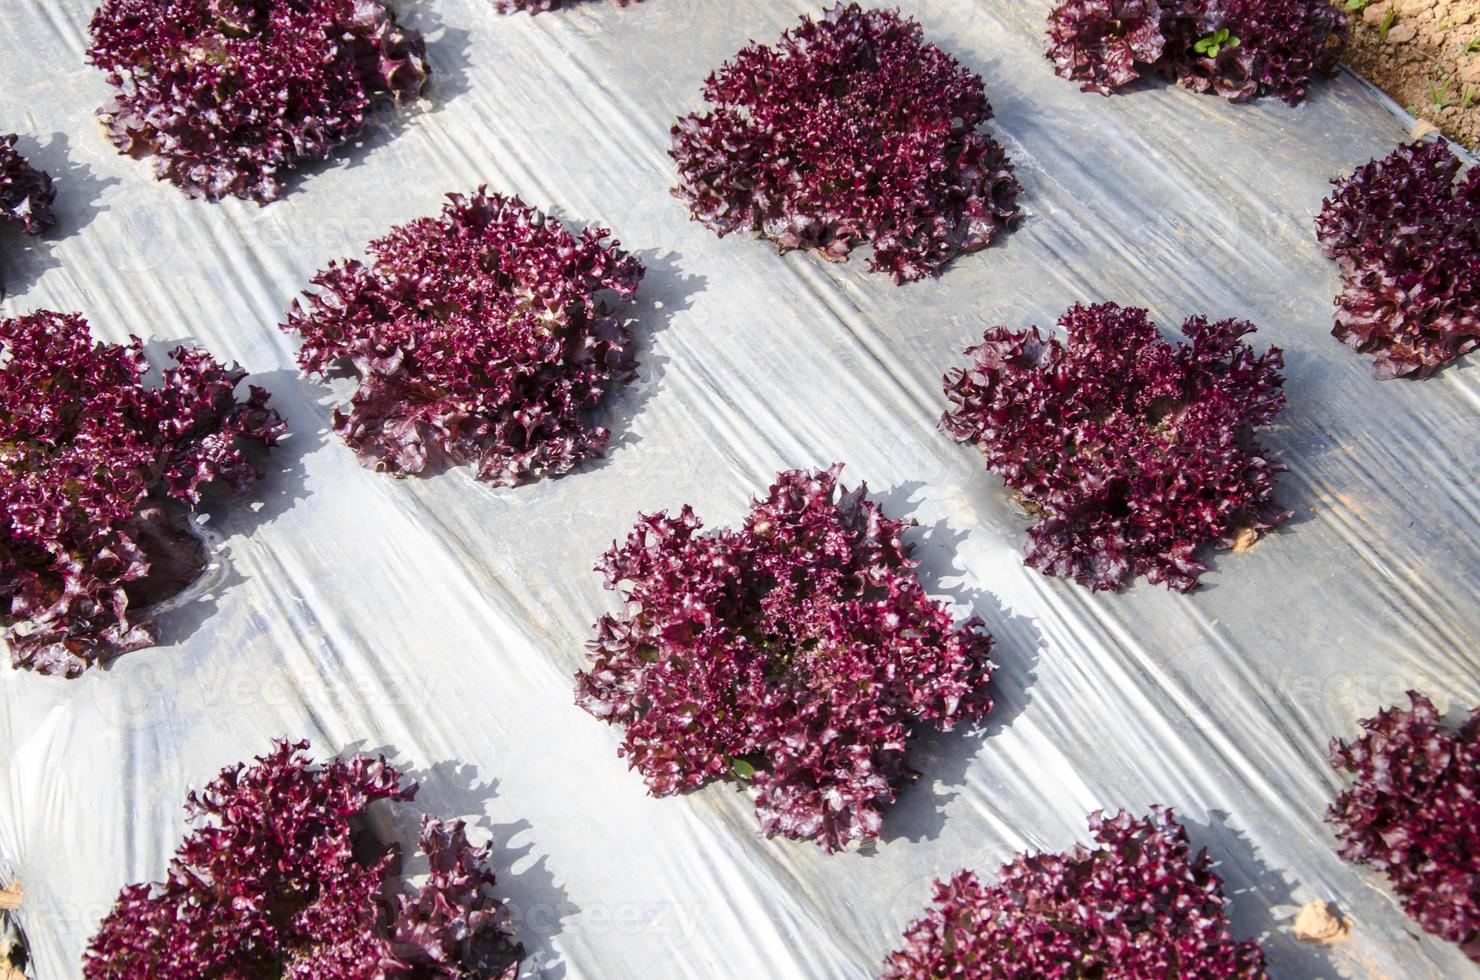 vegetales orgánicos foto